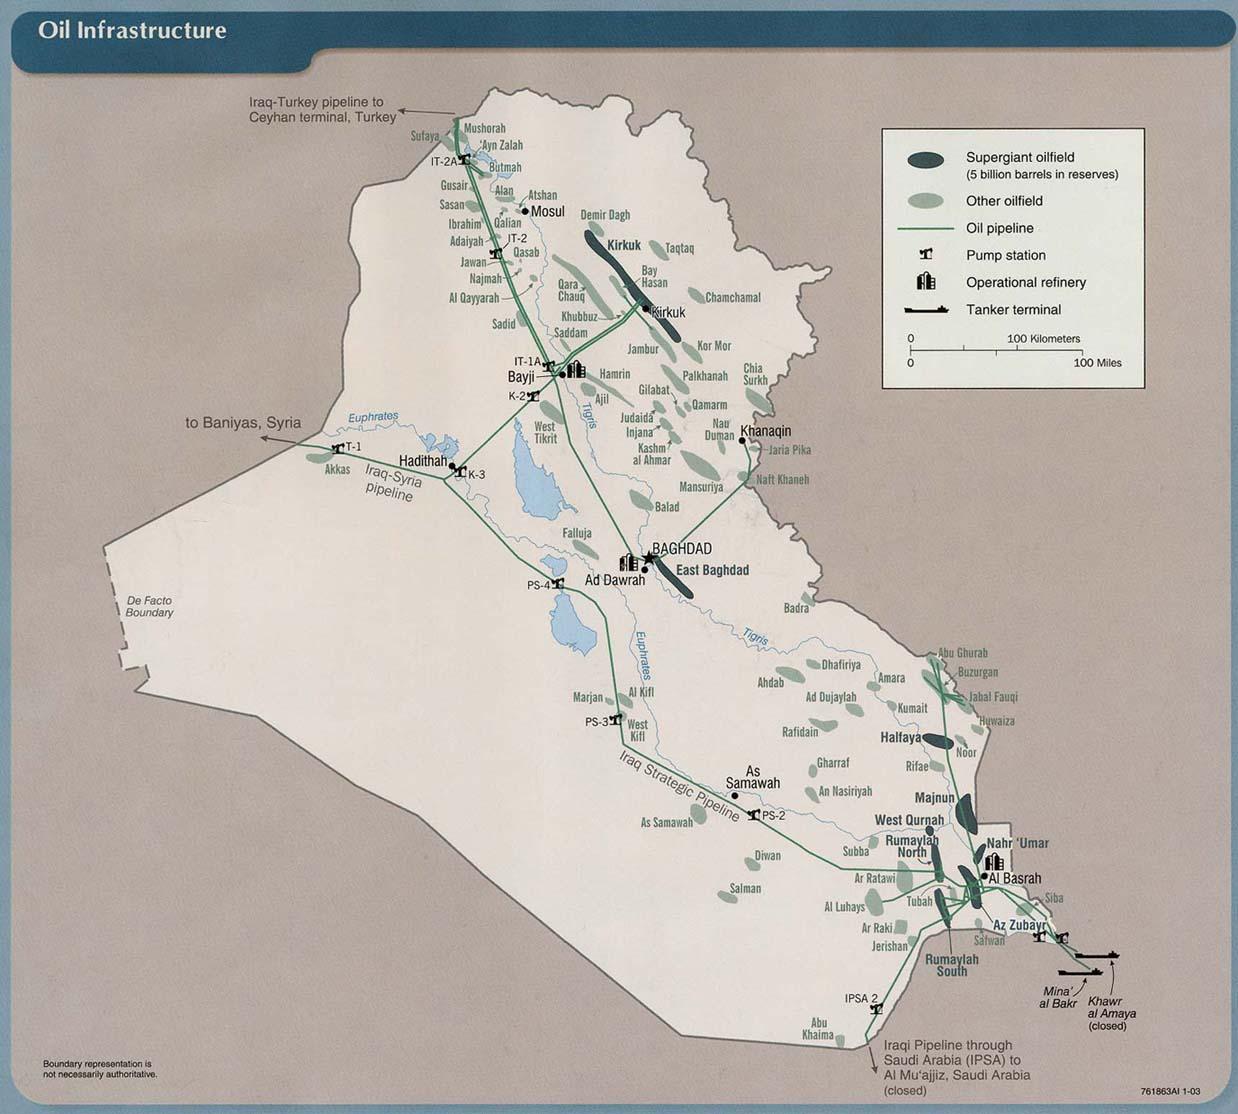 Infraestructura petrolera en Iraq 2003